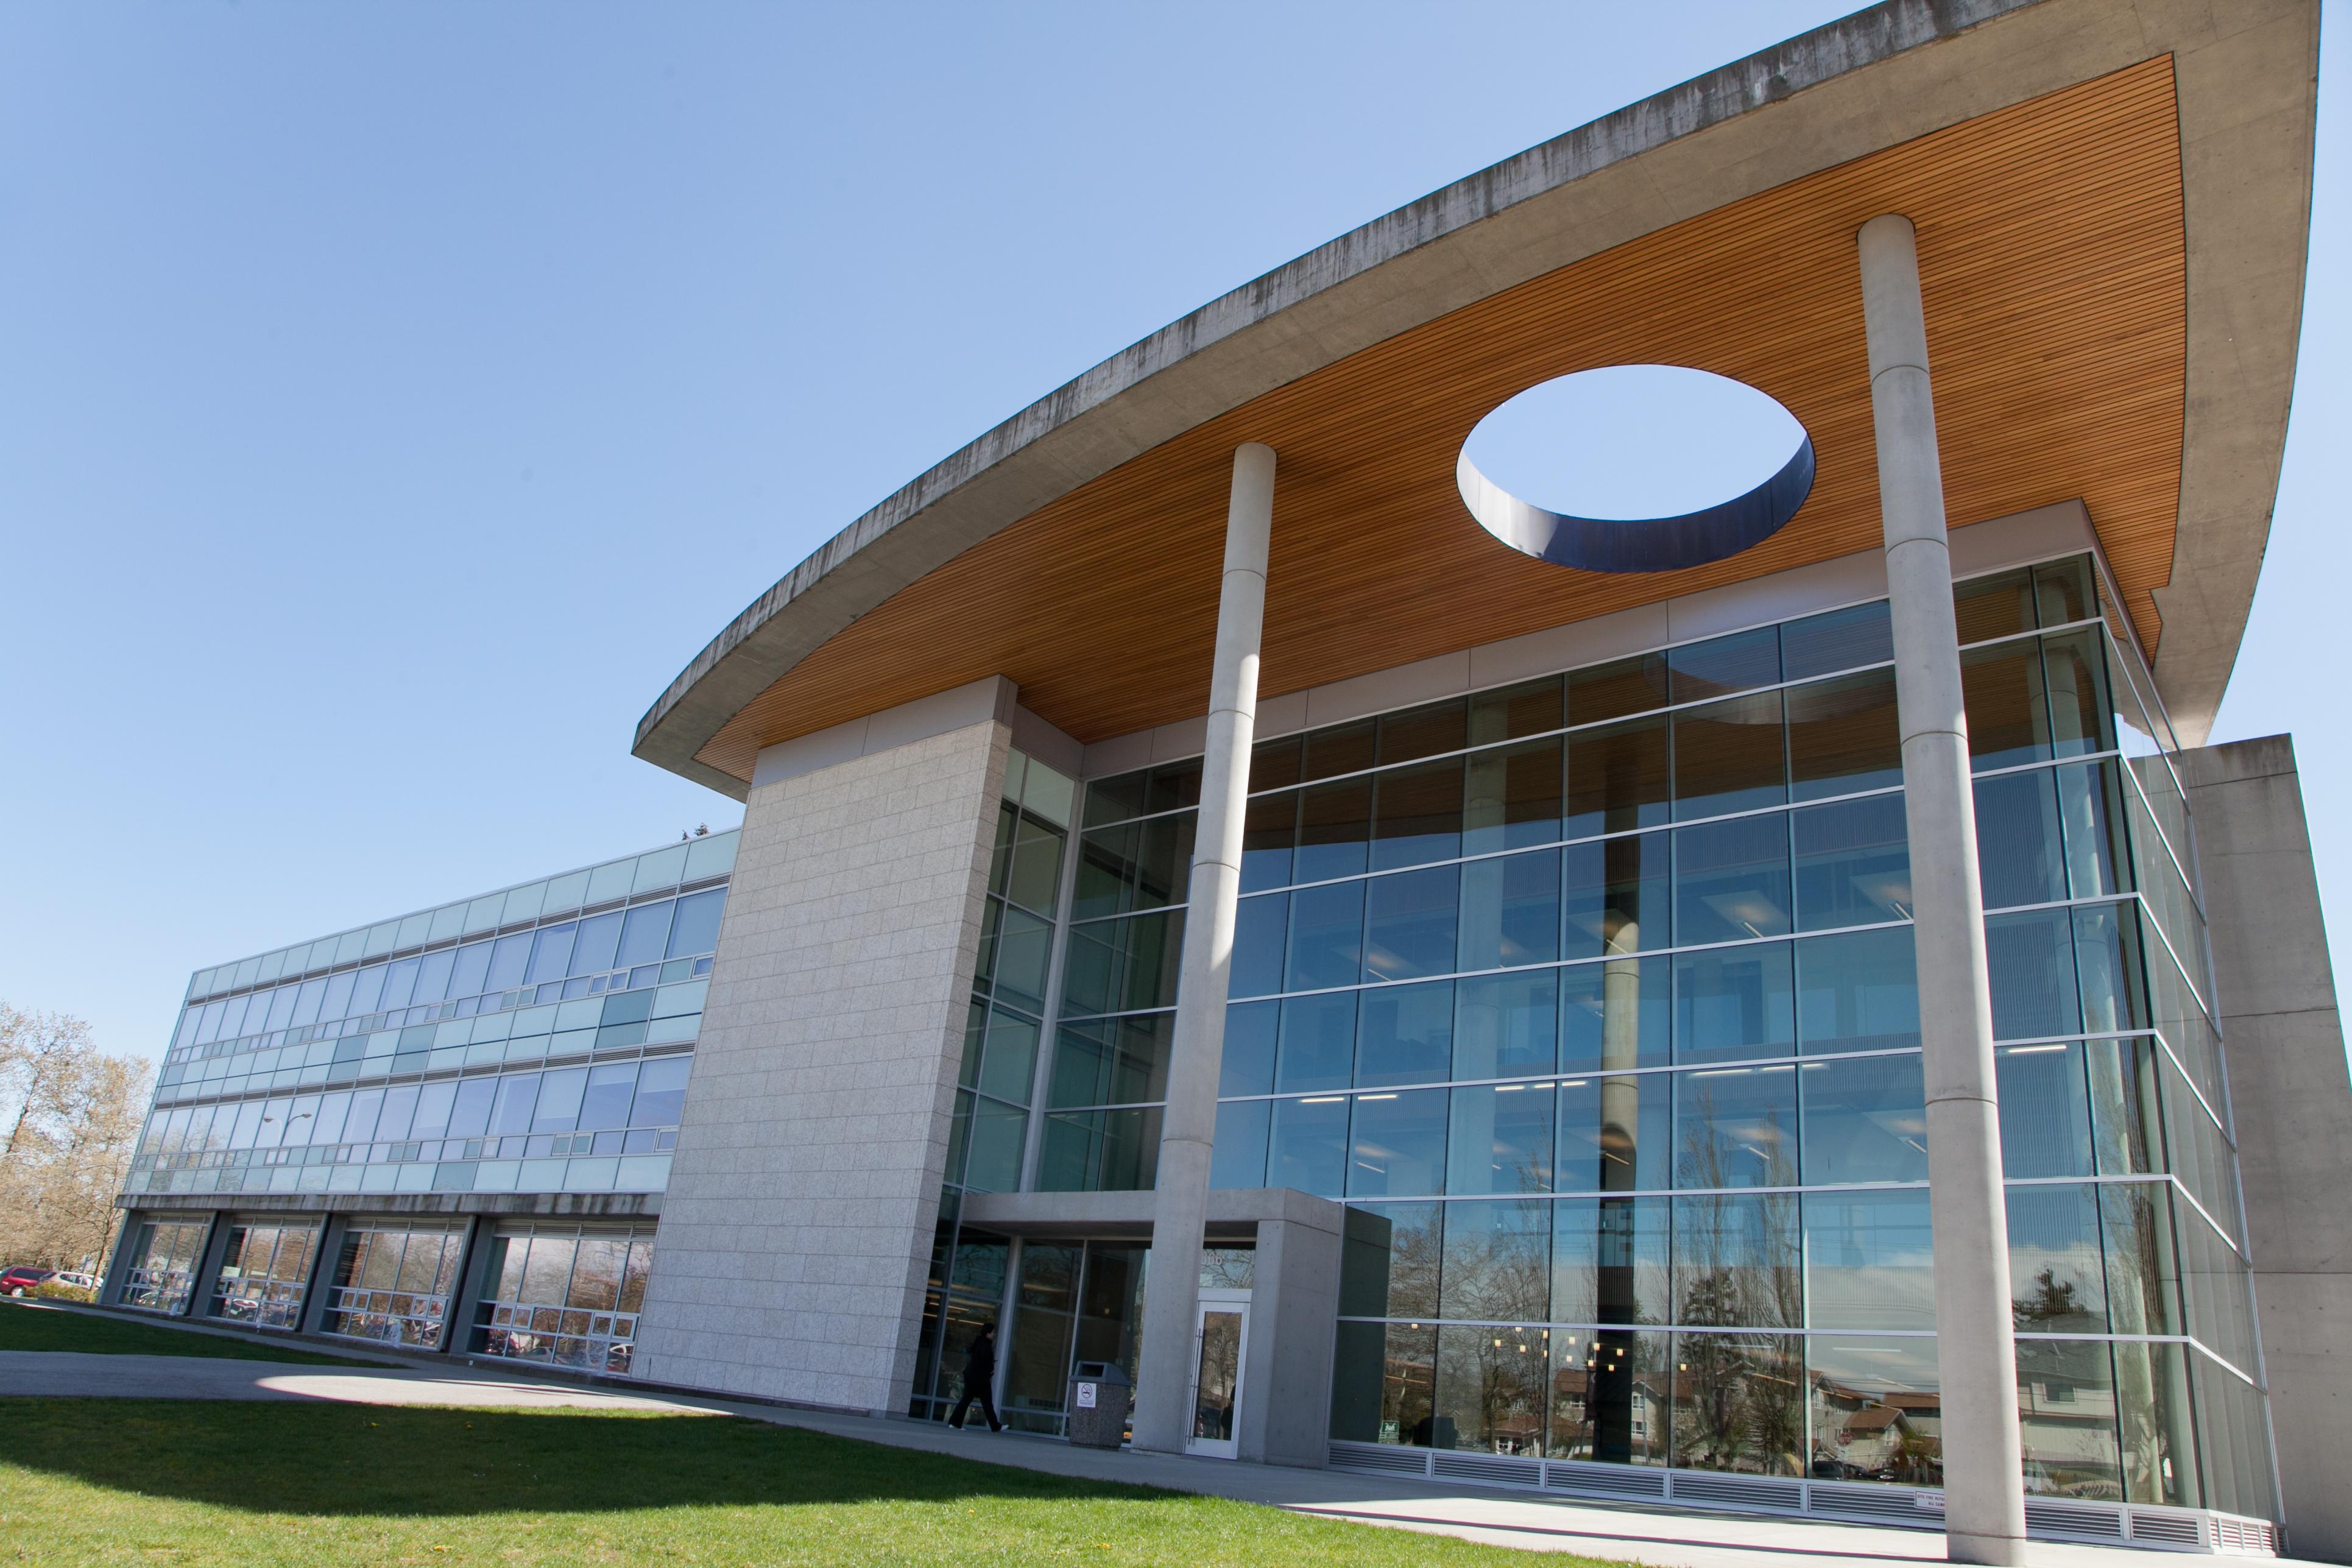 http://upload.wikimedia.org/wikipedia/commons/7/79/Kwantlen_Polytechnic_University,_Surrey_Campus,_Main_building_(exterior).jpg